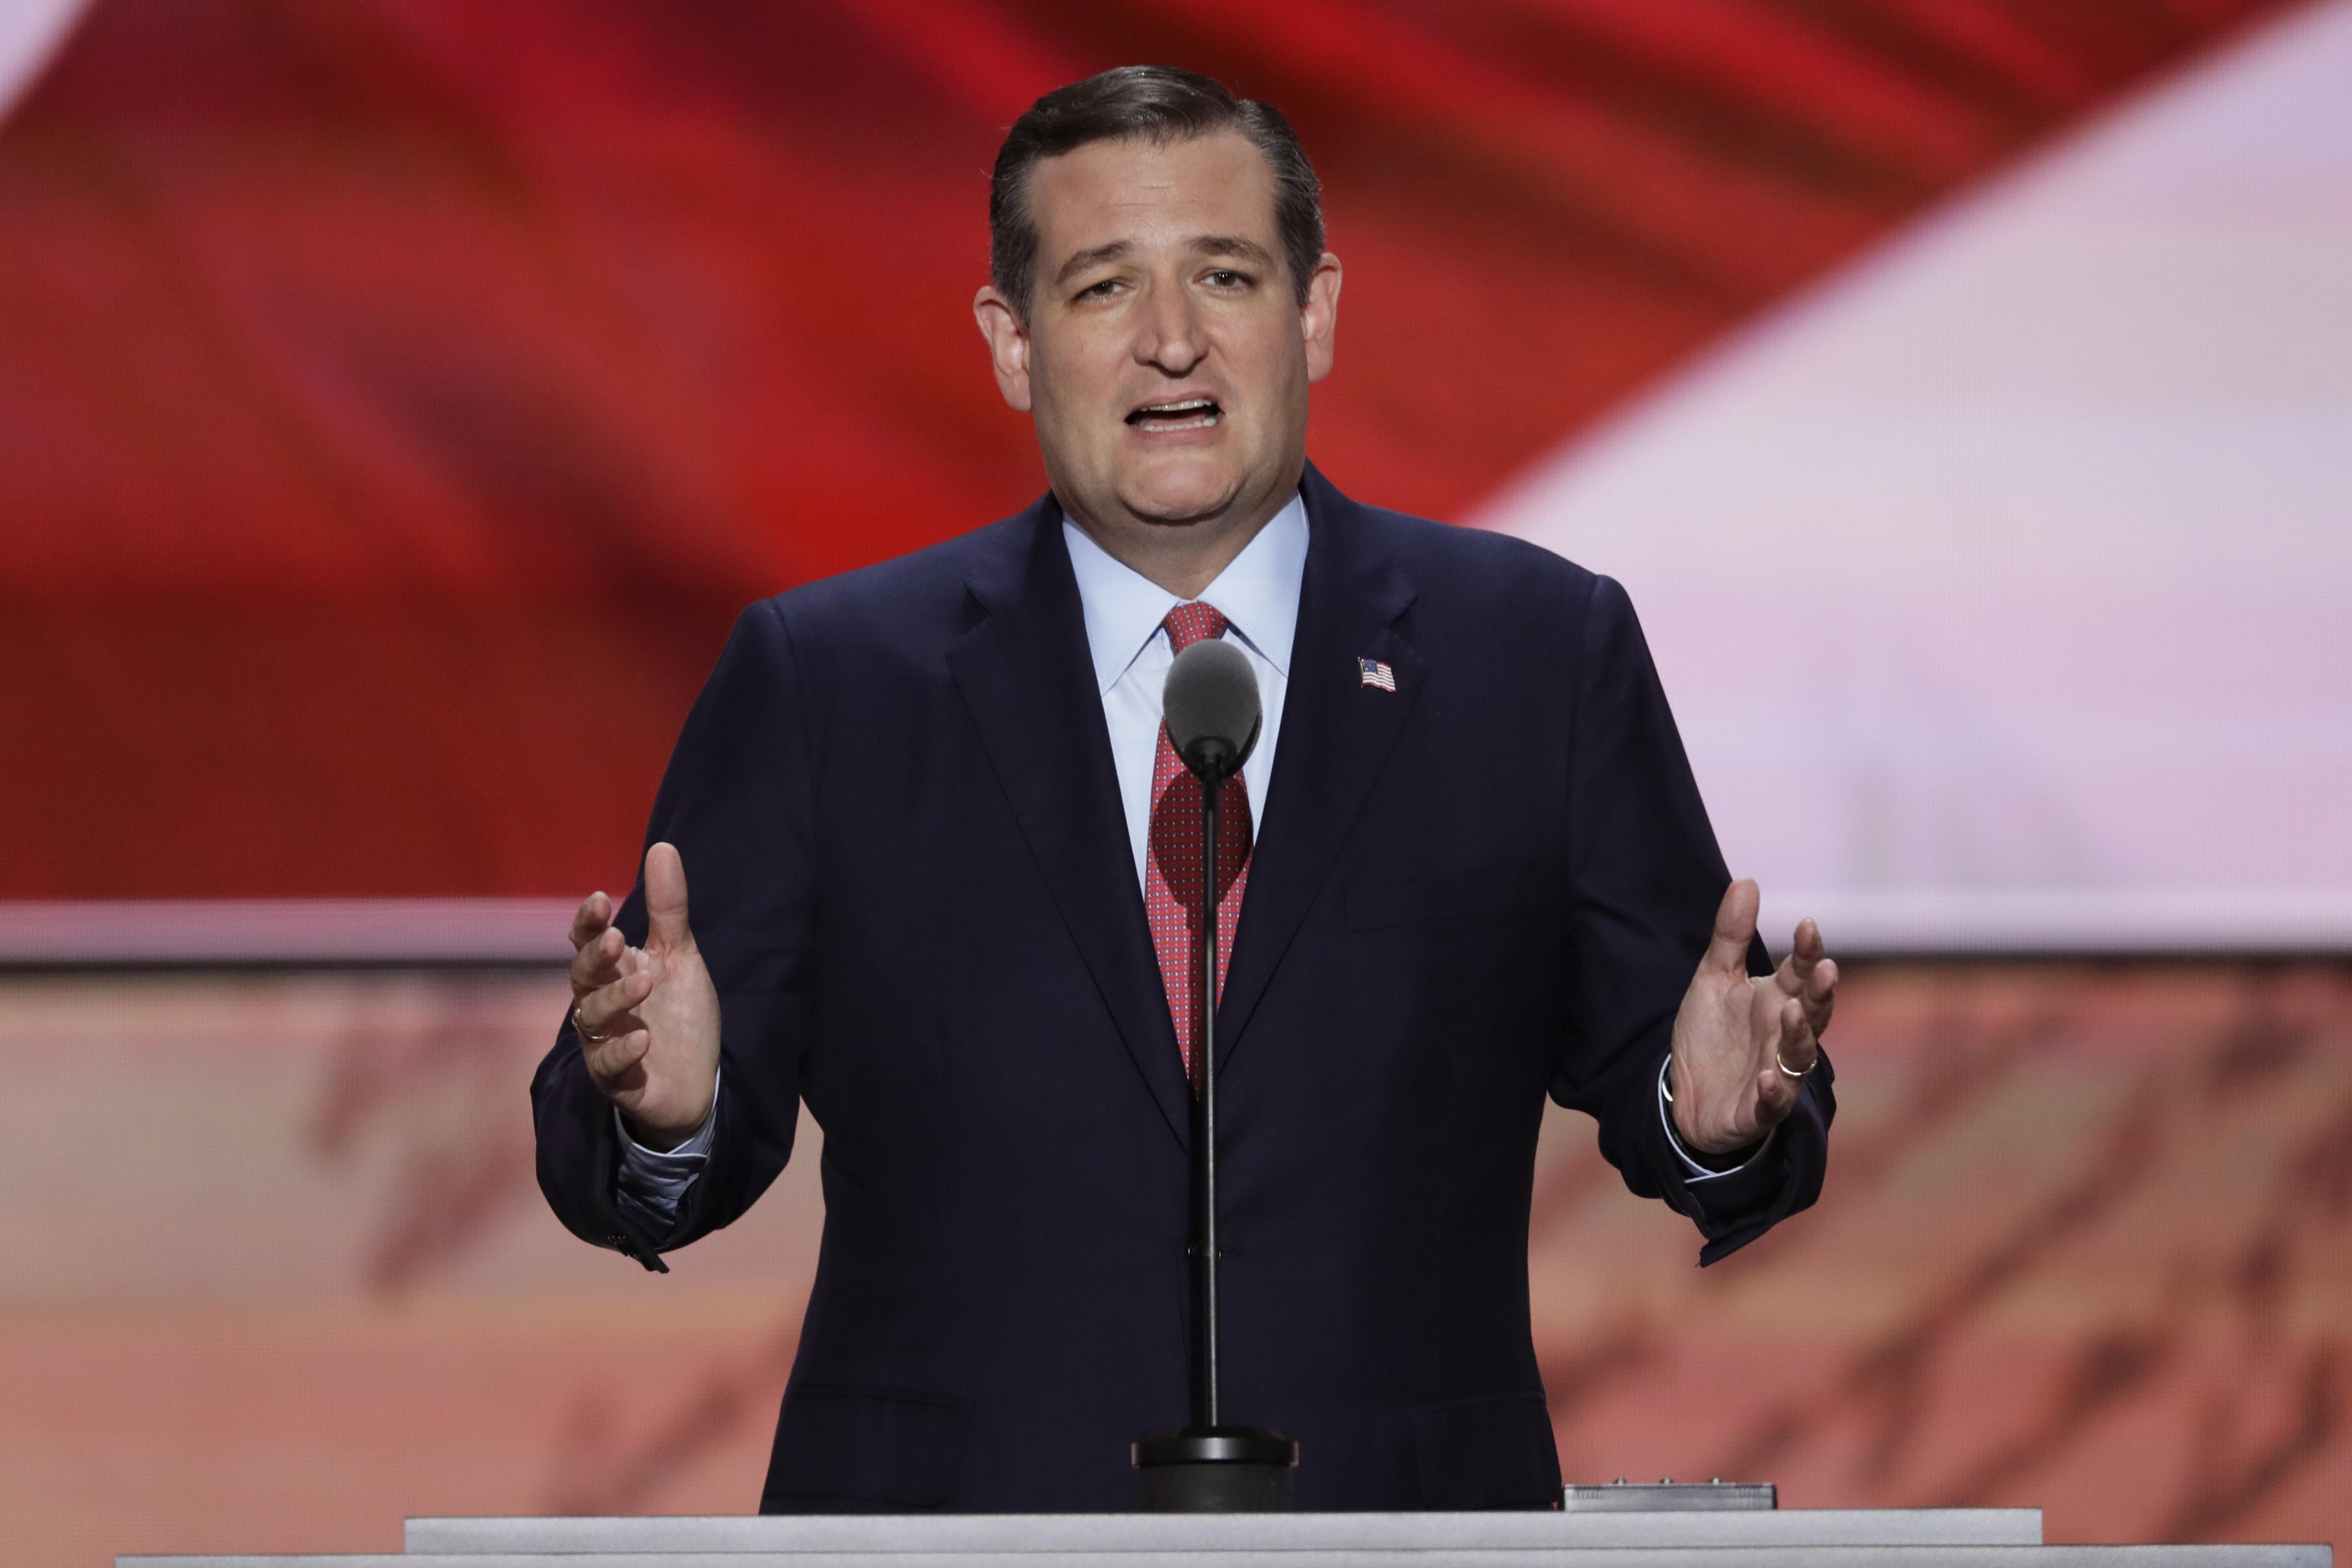 Senator Ted Cruz, Former Presidential Candidate